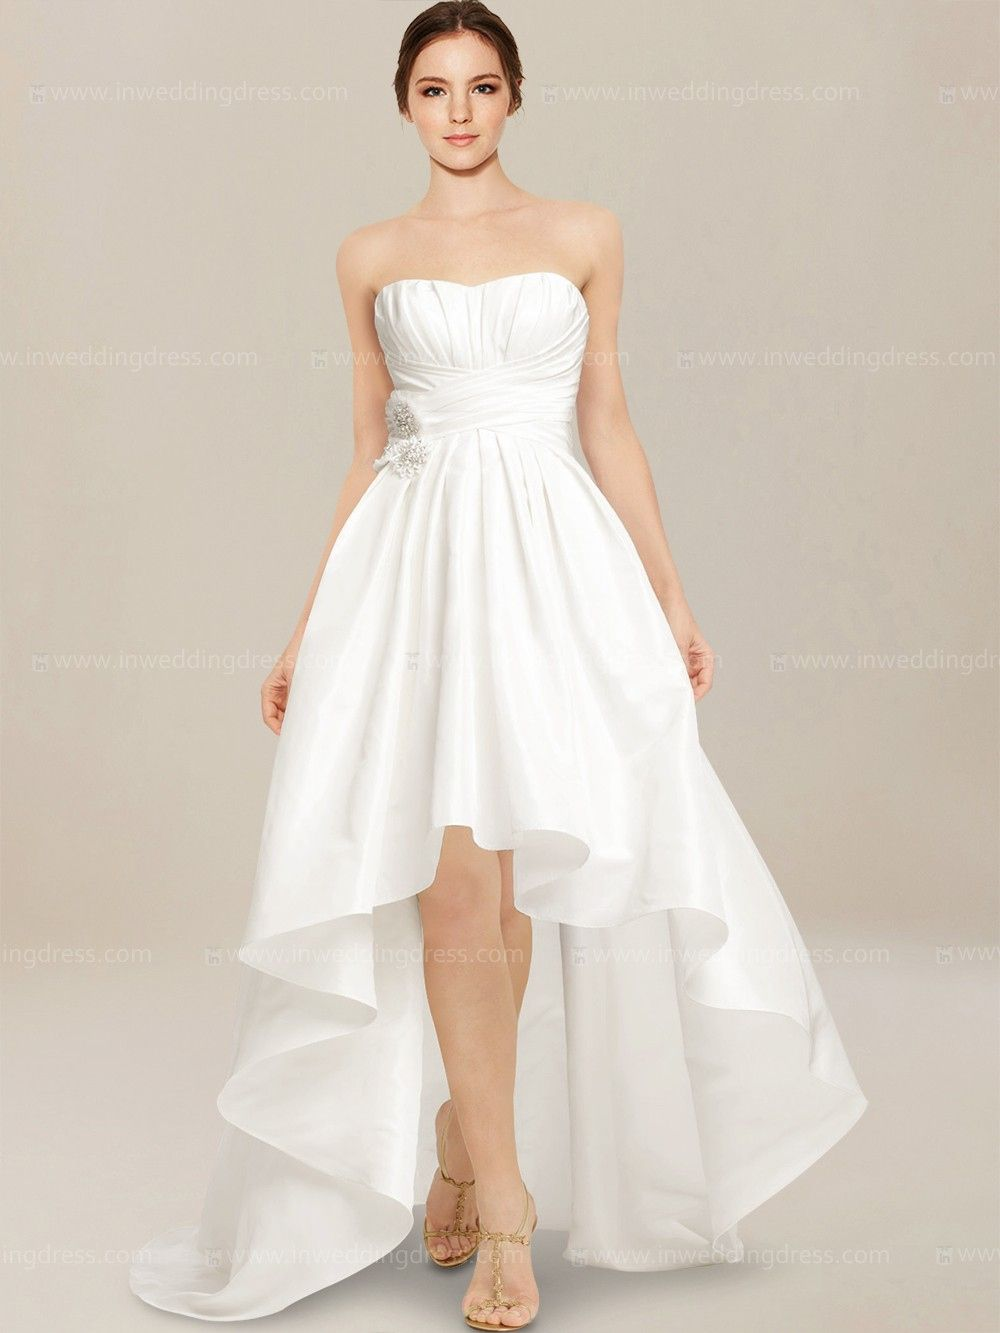 100+ Weddings Dresses for the Beach - Best Shapewear for Wedding ...